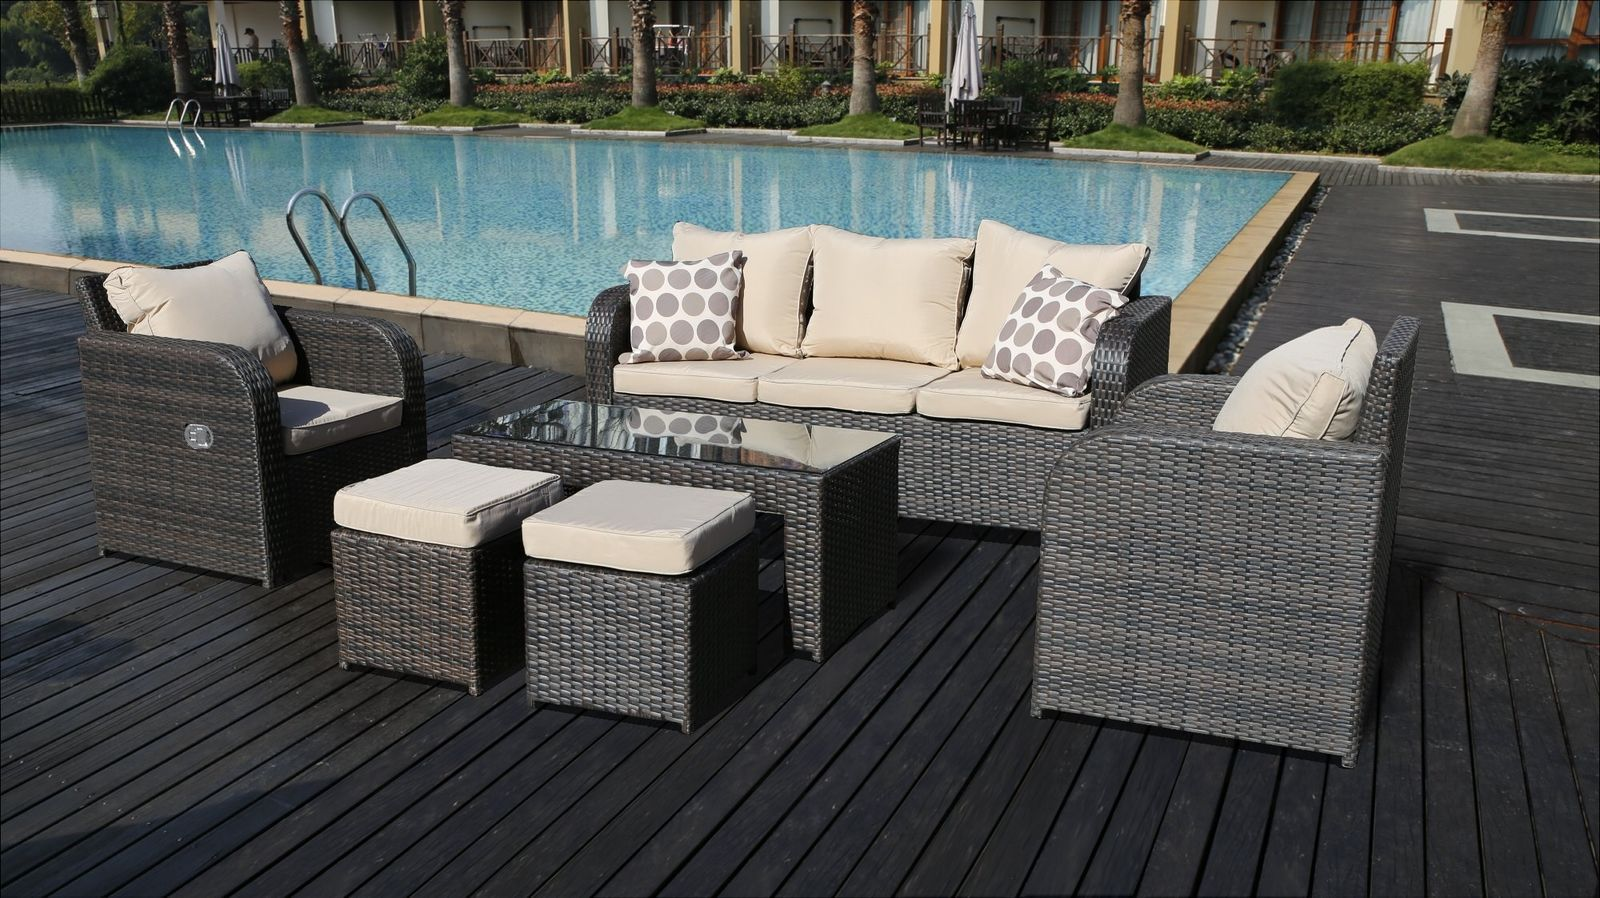 7 Seater Rattan Garden Furniture Sofa Set Plus Reclining Chairs